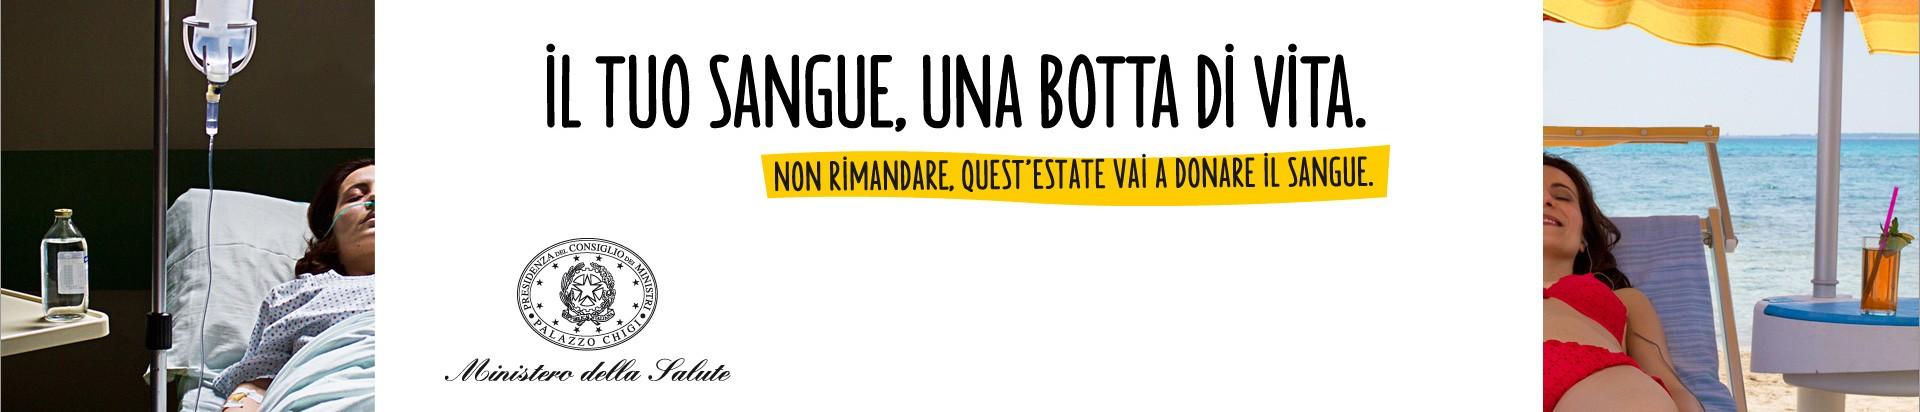 1_banner-image_Sangue2015